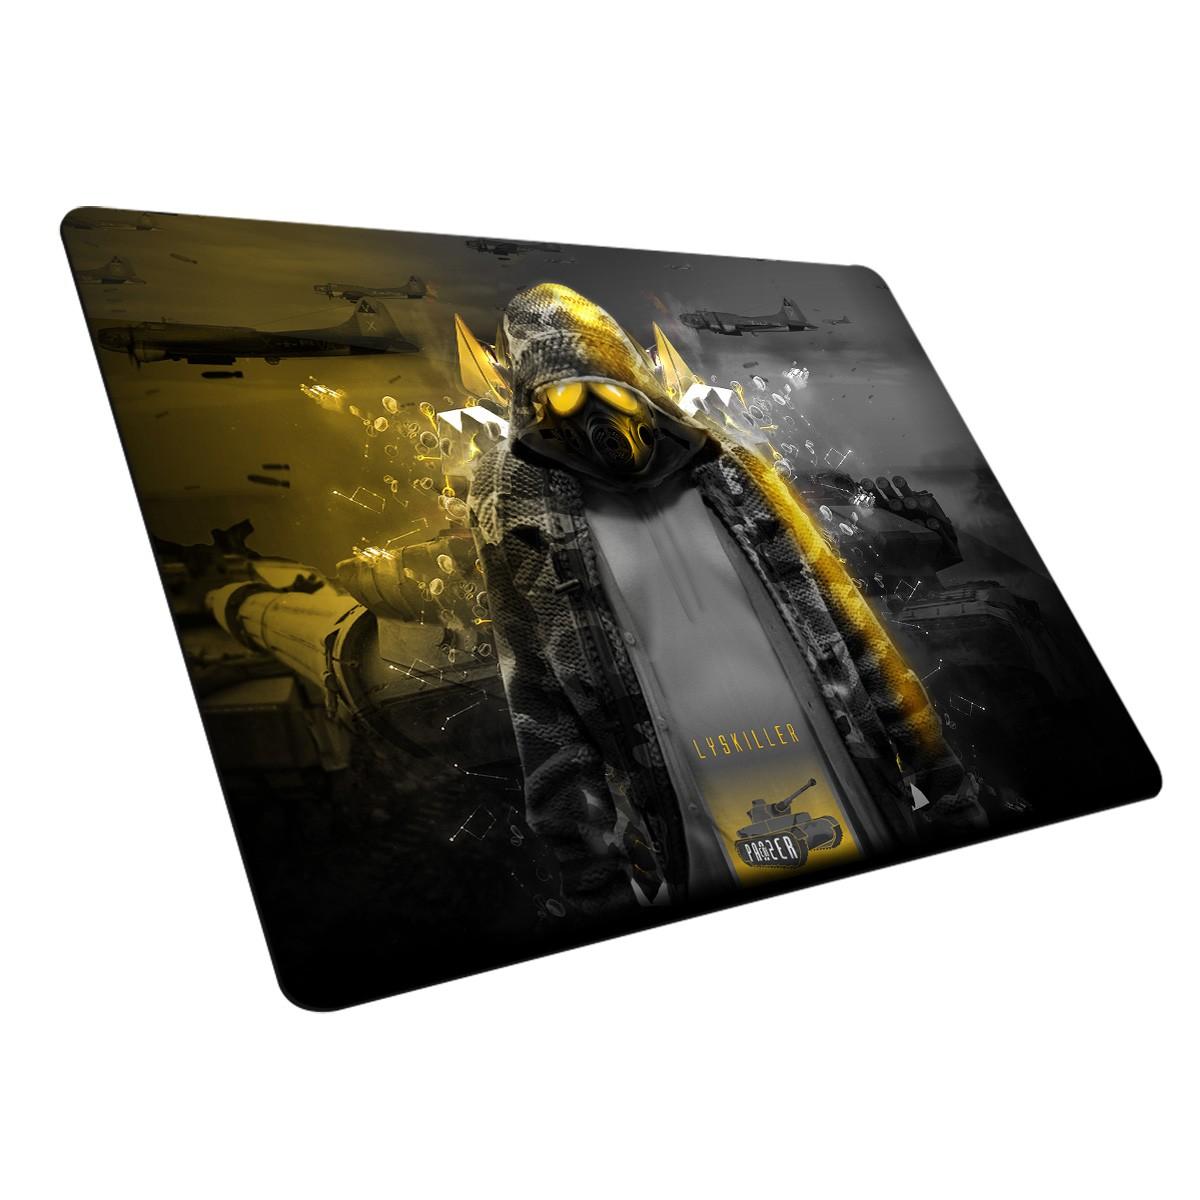 Mousepad Gamer Enipanzer Warpad88 Lyskiller Grande 45x40  - Fatality